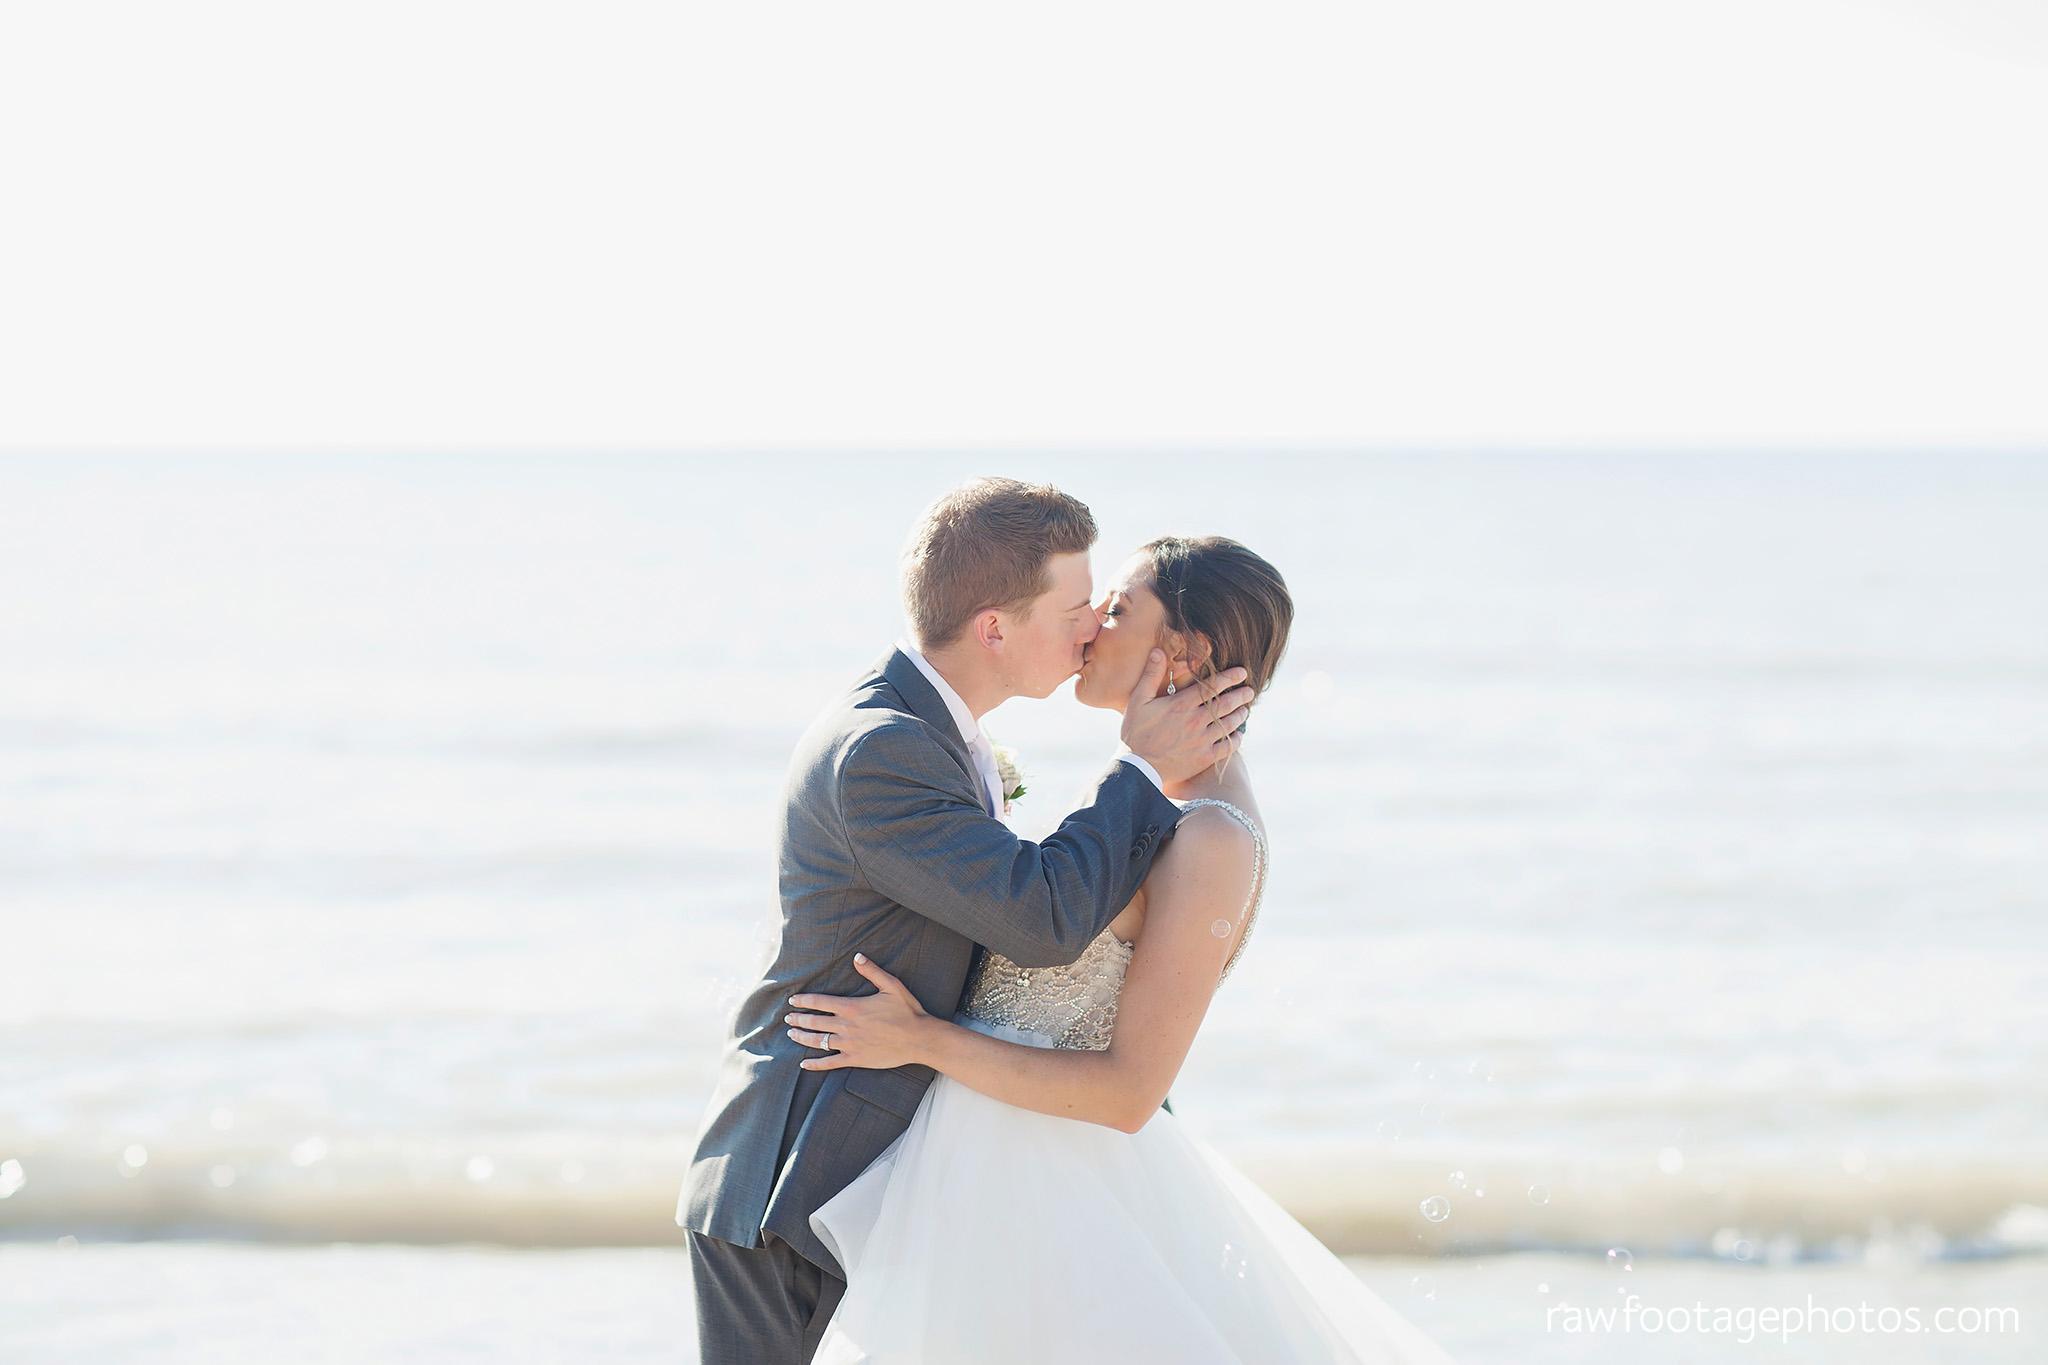 london_ontario_wedding_photographer-grand_bend_wedding_photographer-oakwood_resort_wedding-beach_wedding-sunset_wedding-raw_footage_photography060.jpg